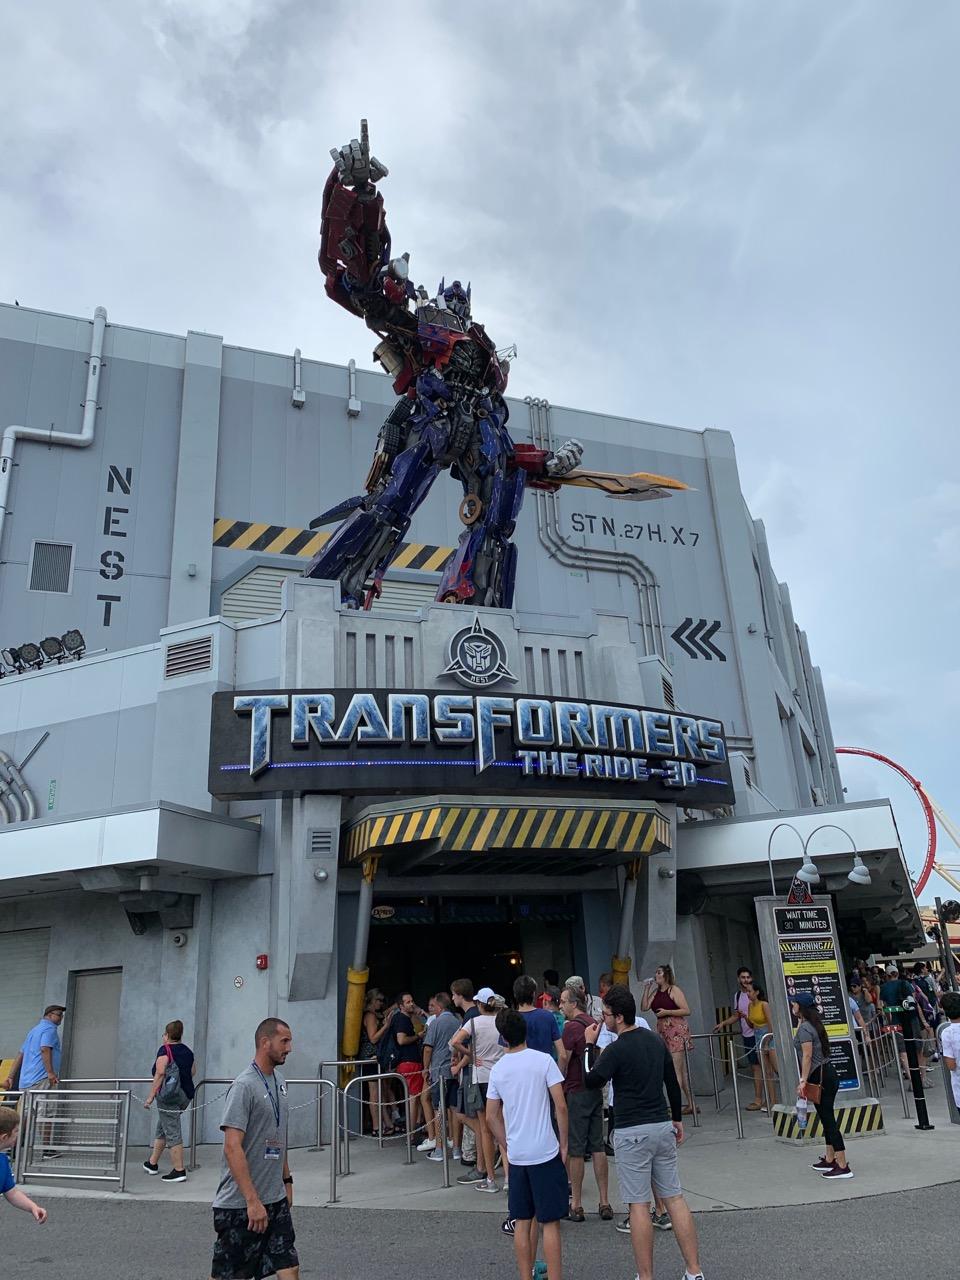 universal studios florida rides guide best rides transformers.jpeg